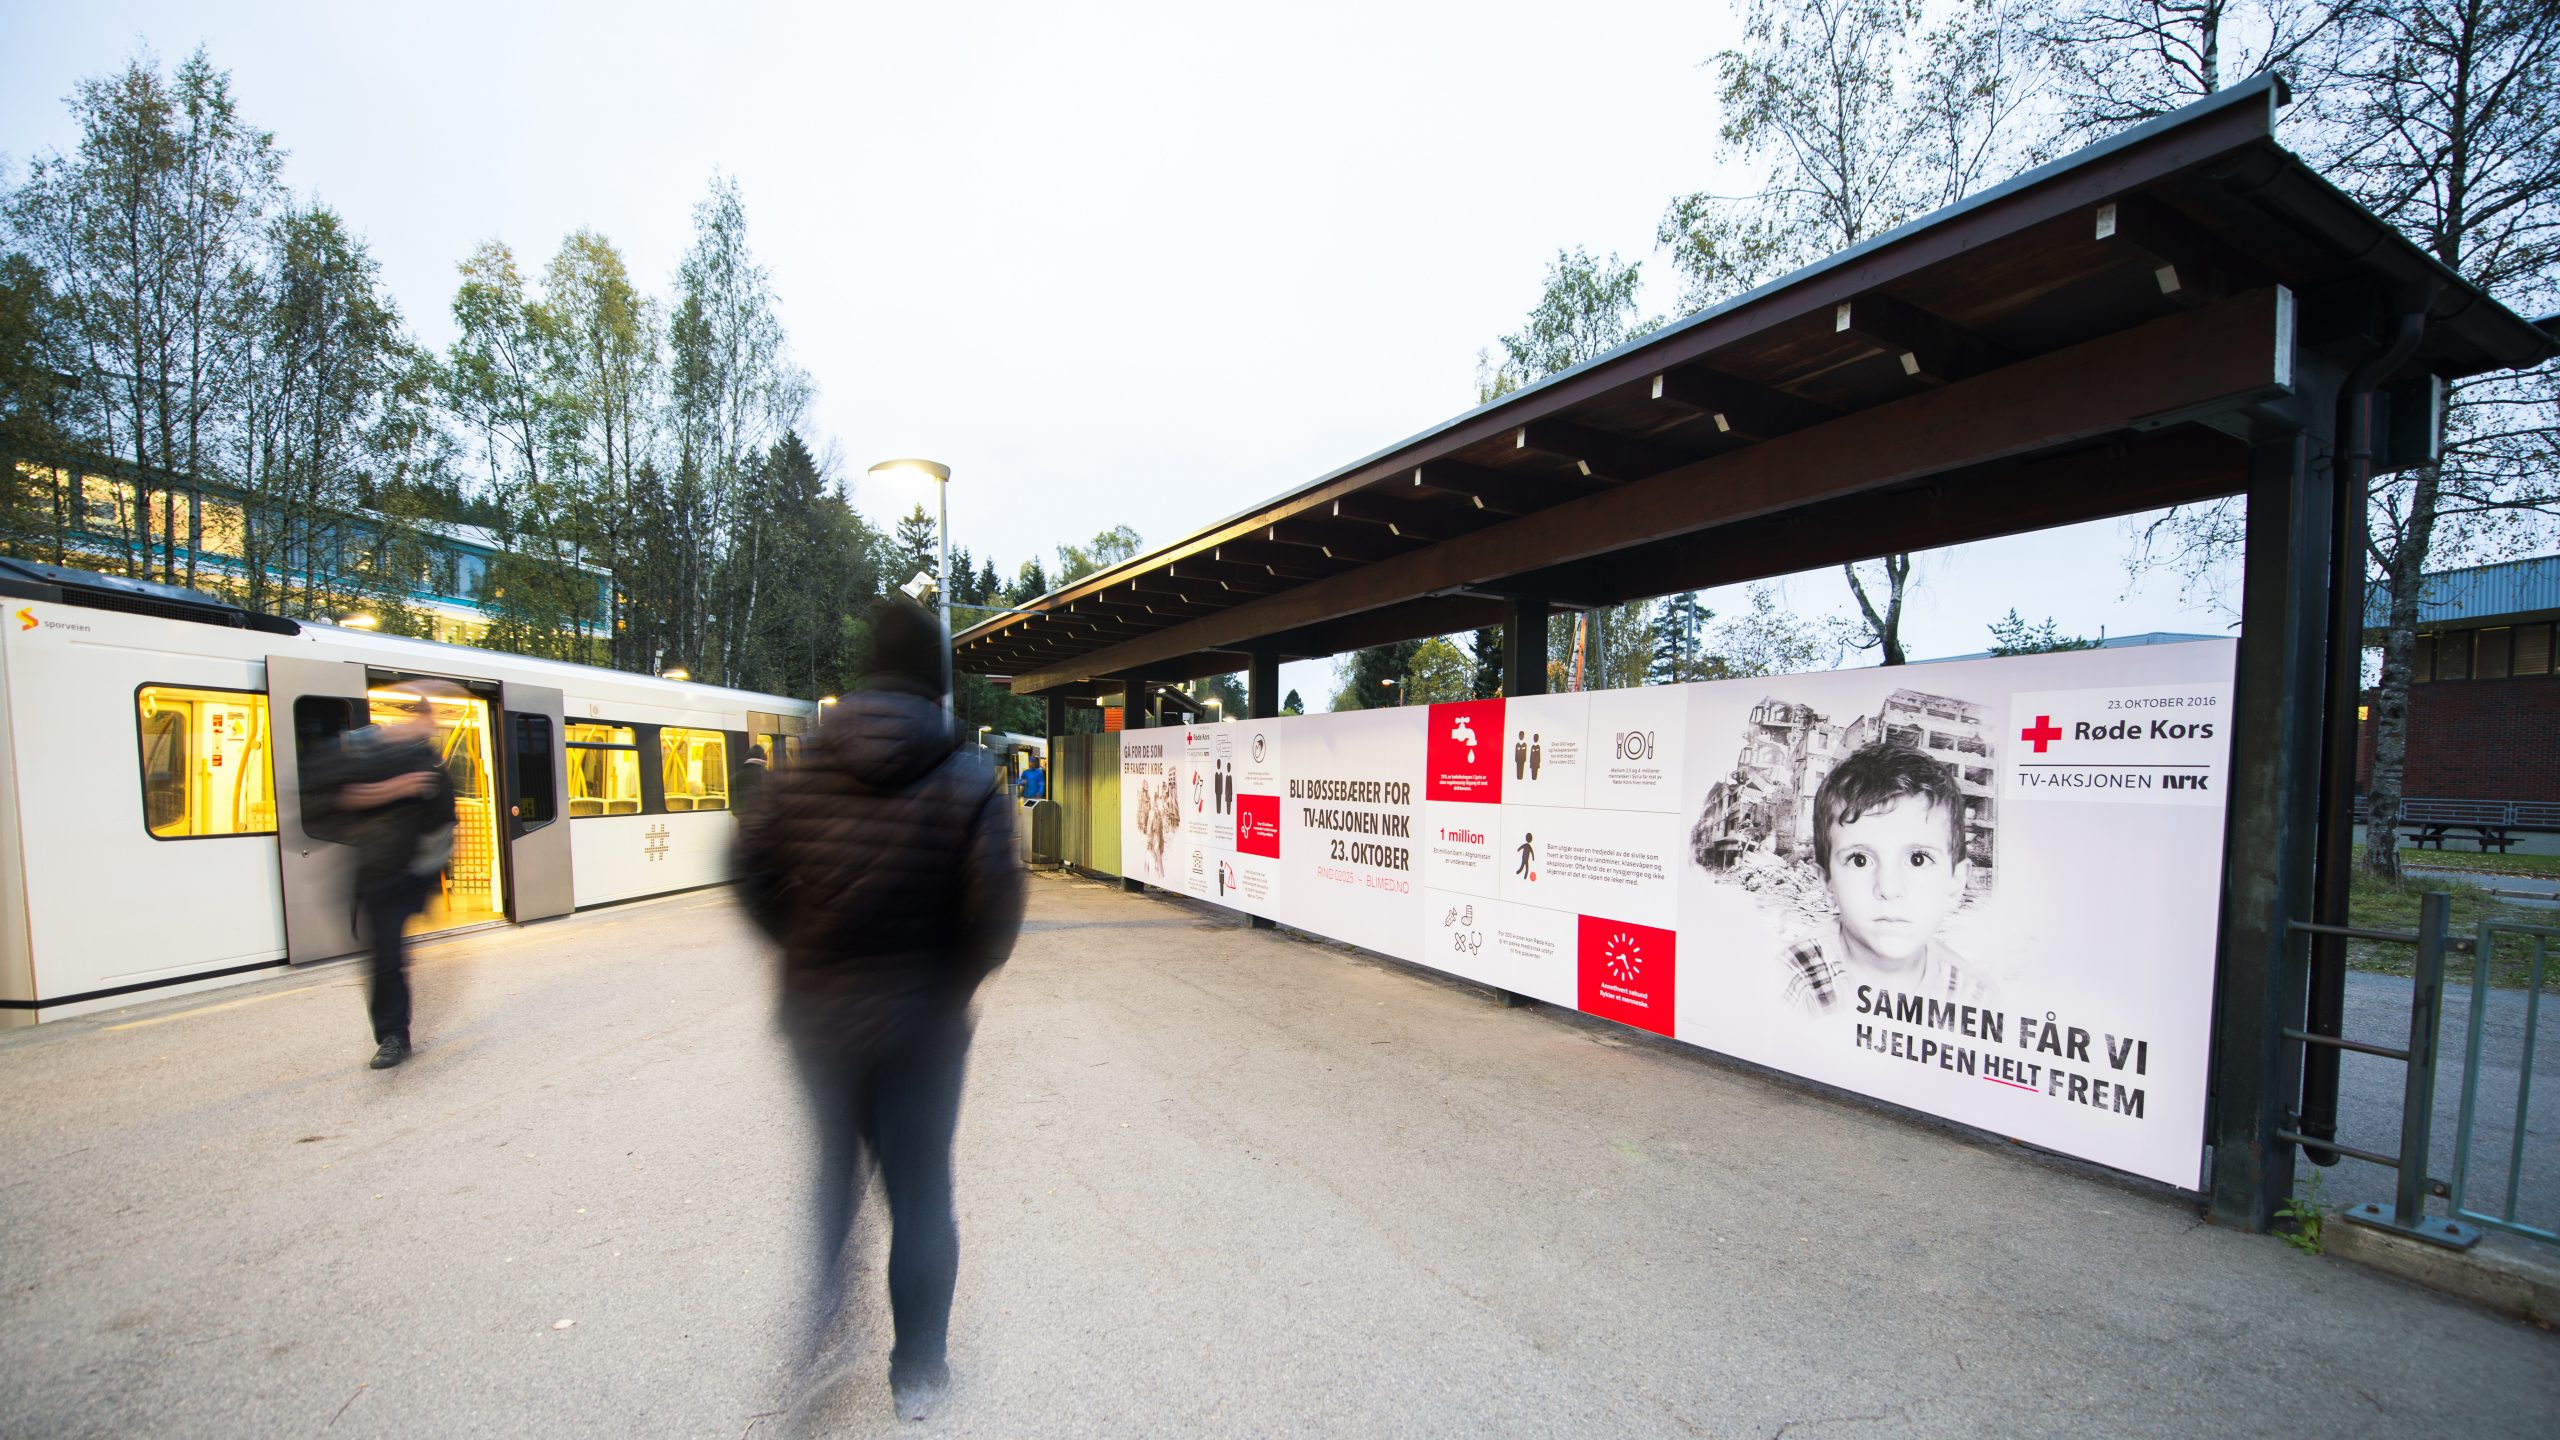 cc-no-2016-w41-rodekorsday-metro-sognsvann-1.jpg